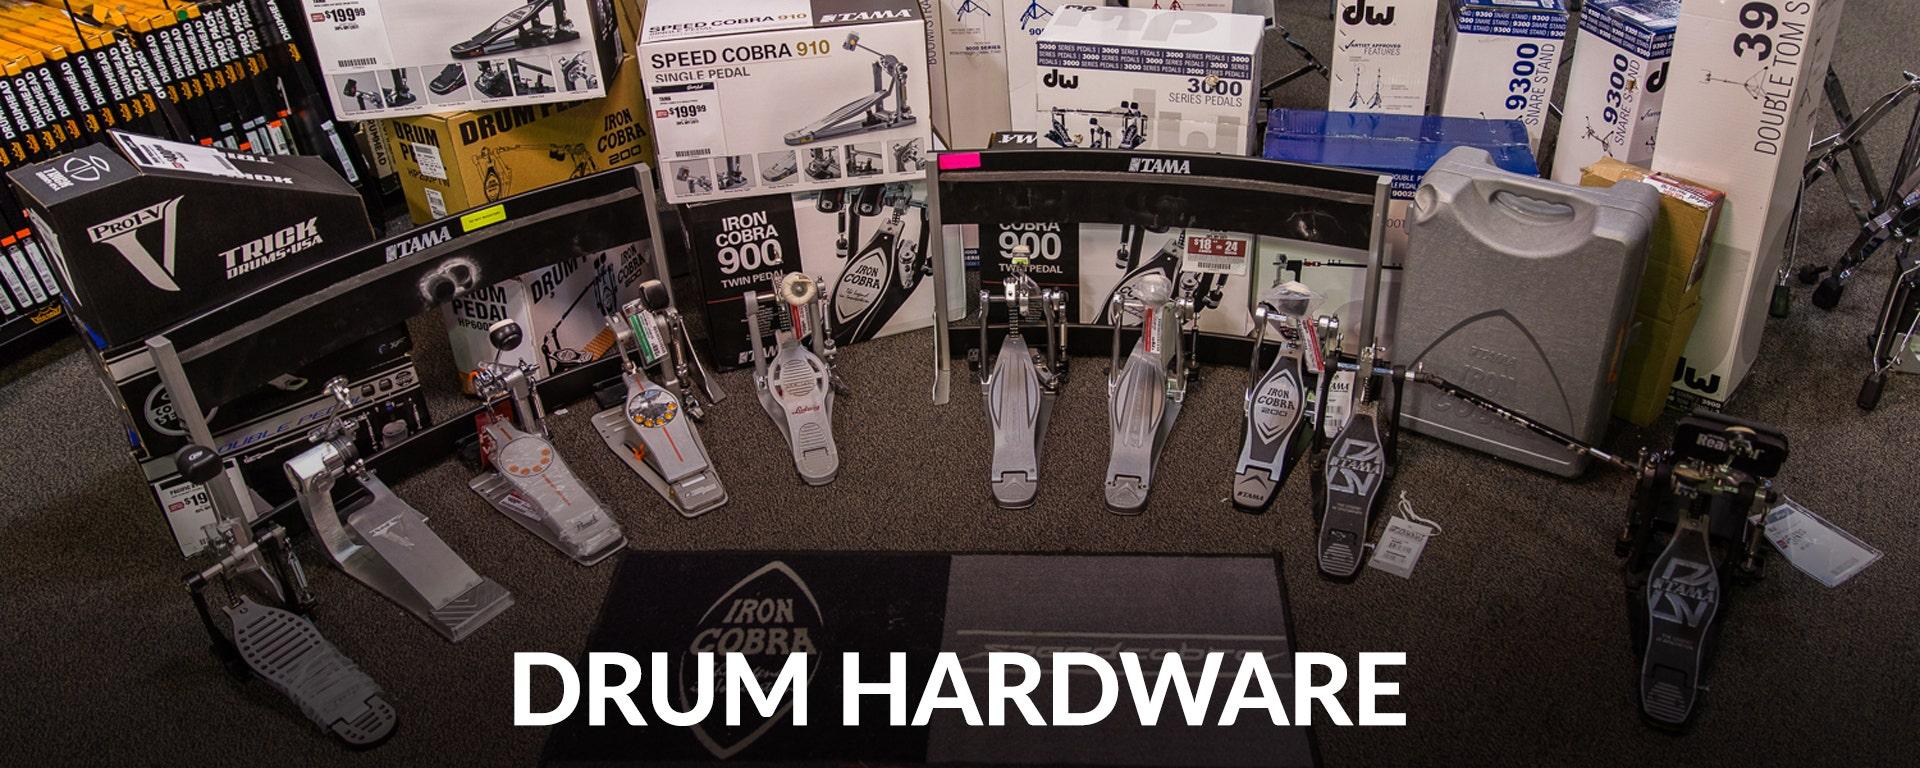 Drum Hardware At samash.com